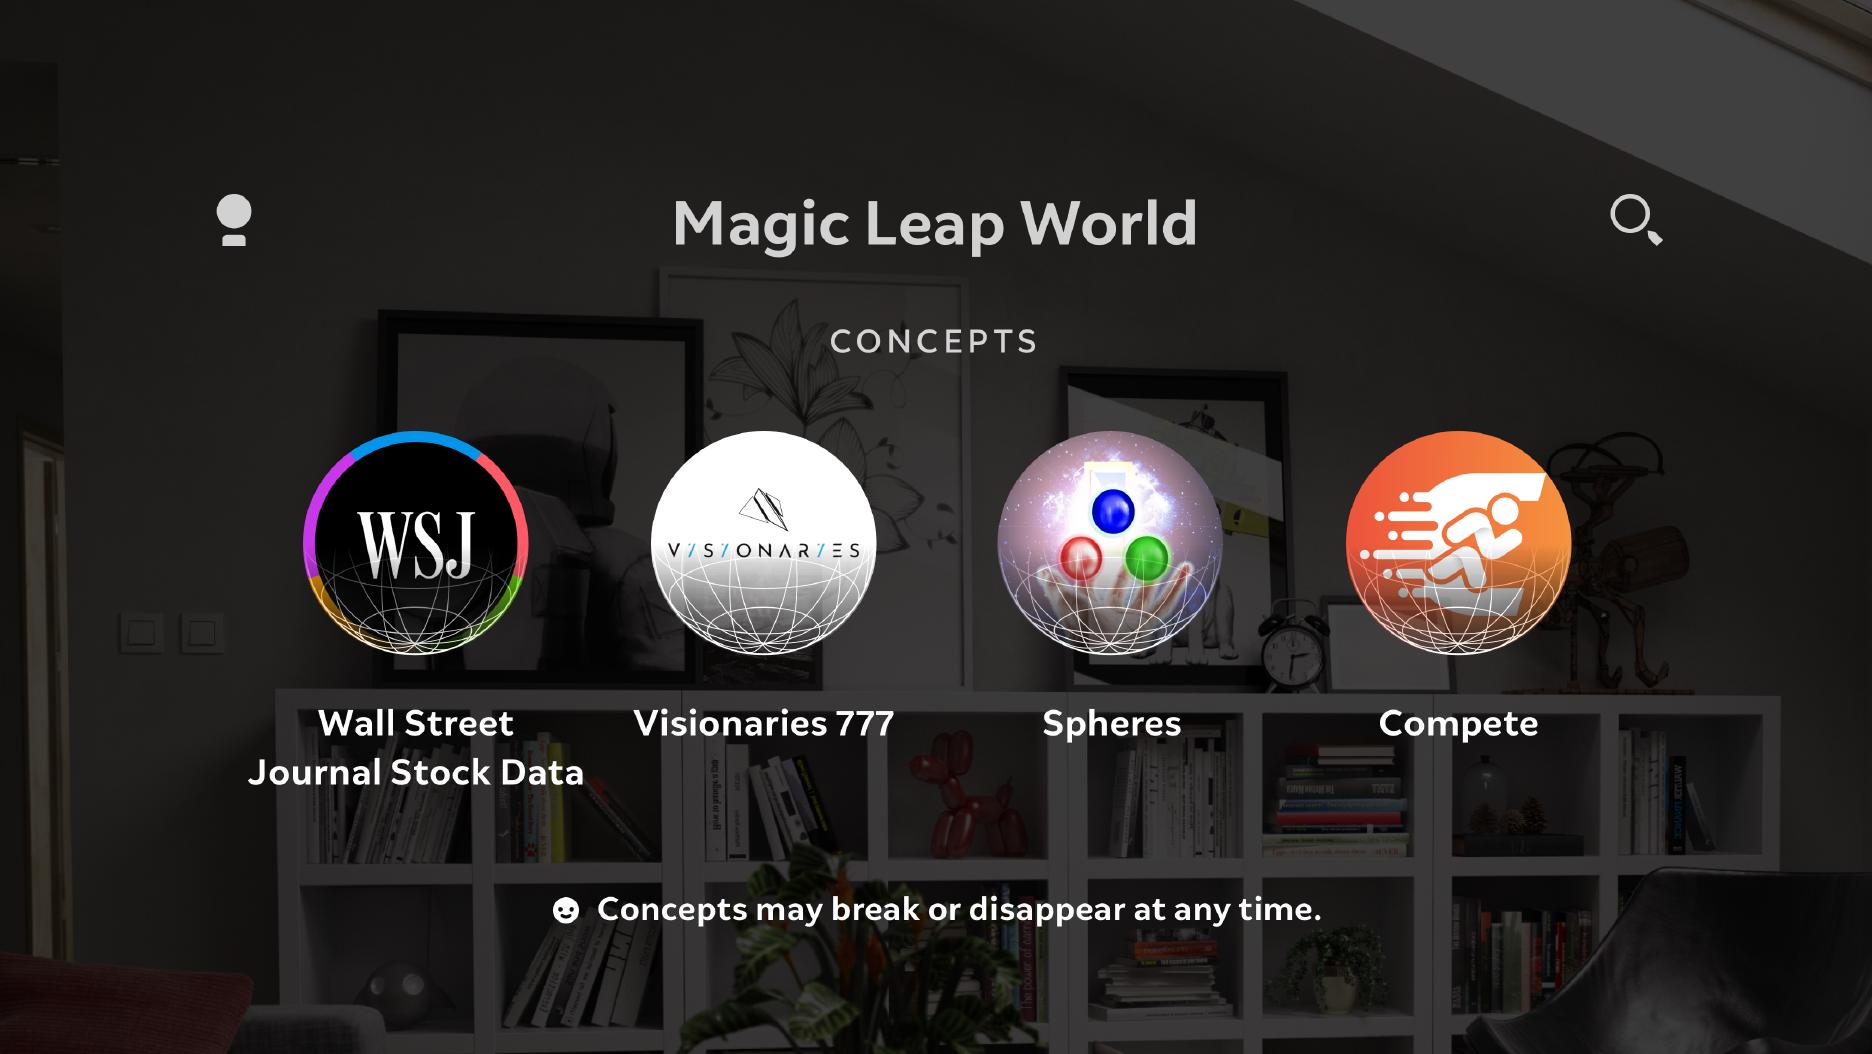 Magic Leap Concepts